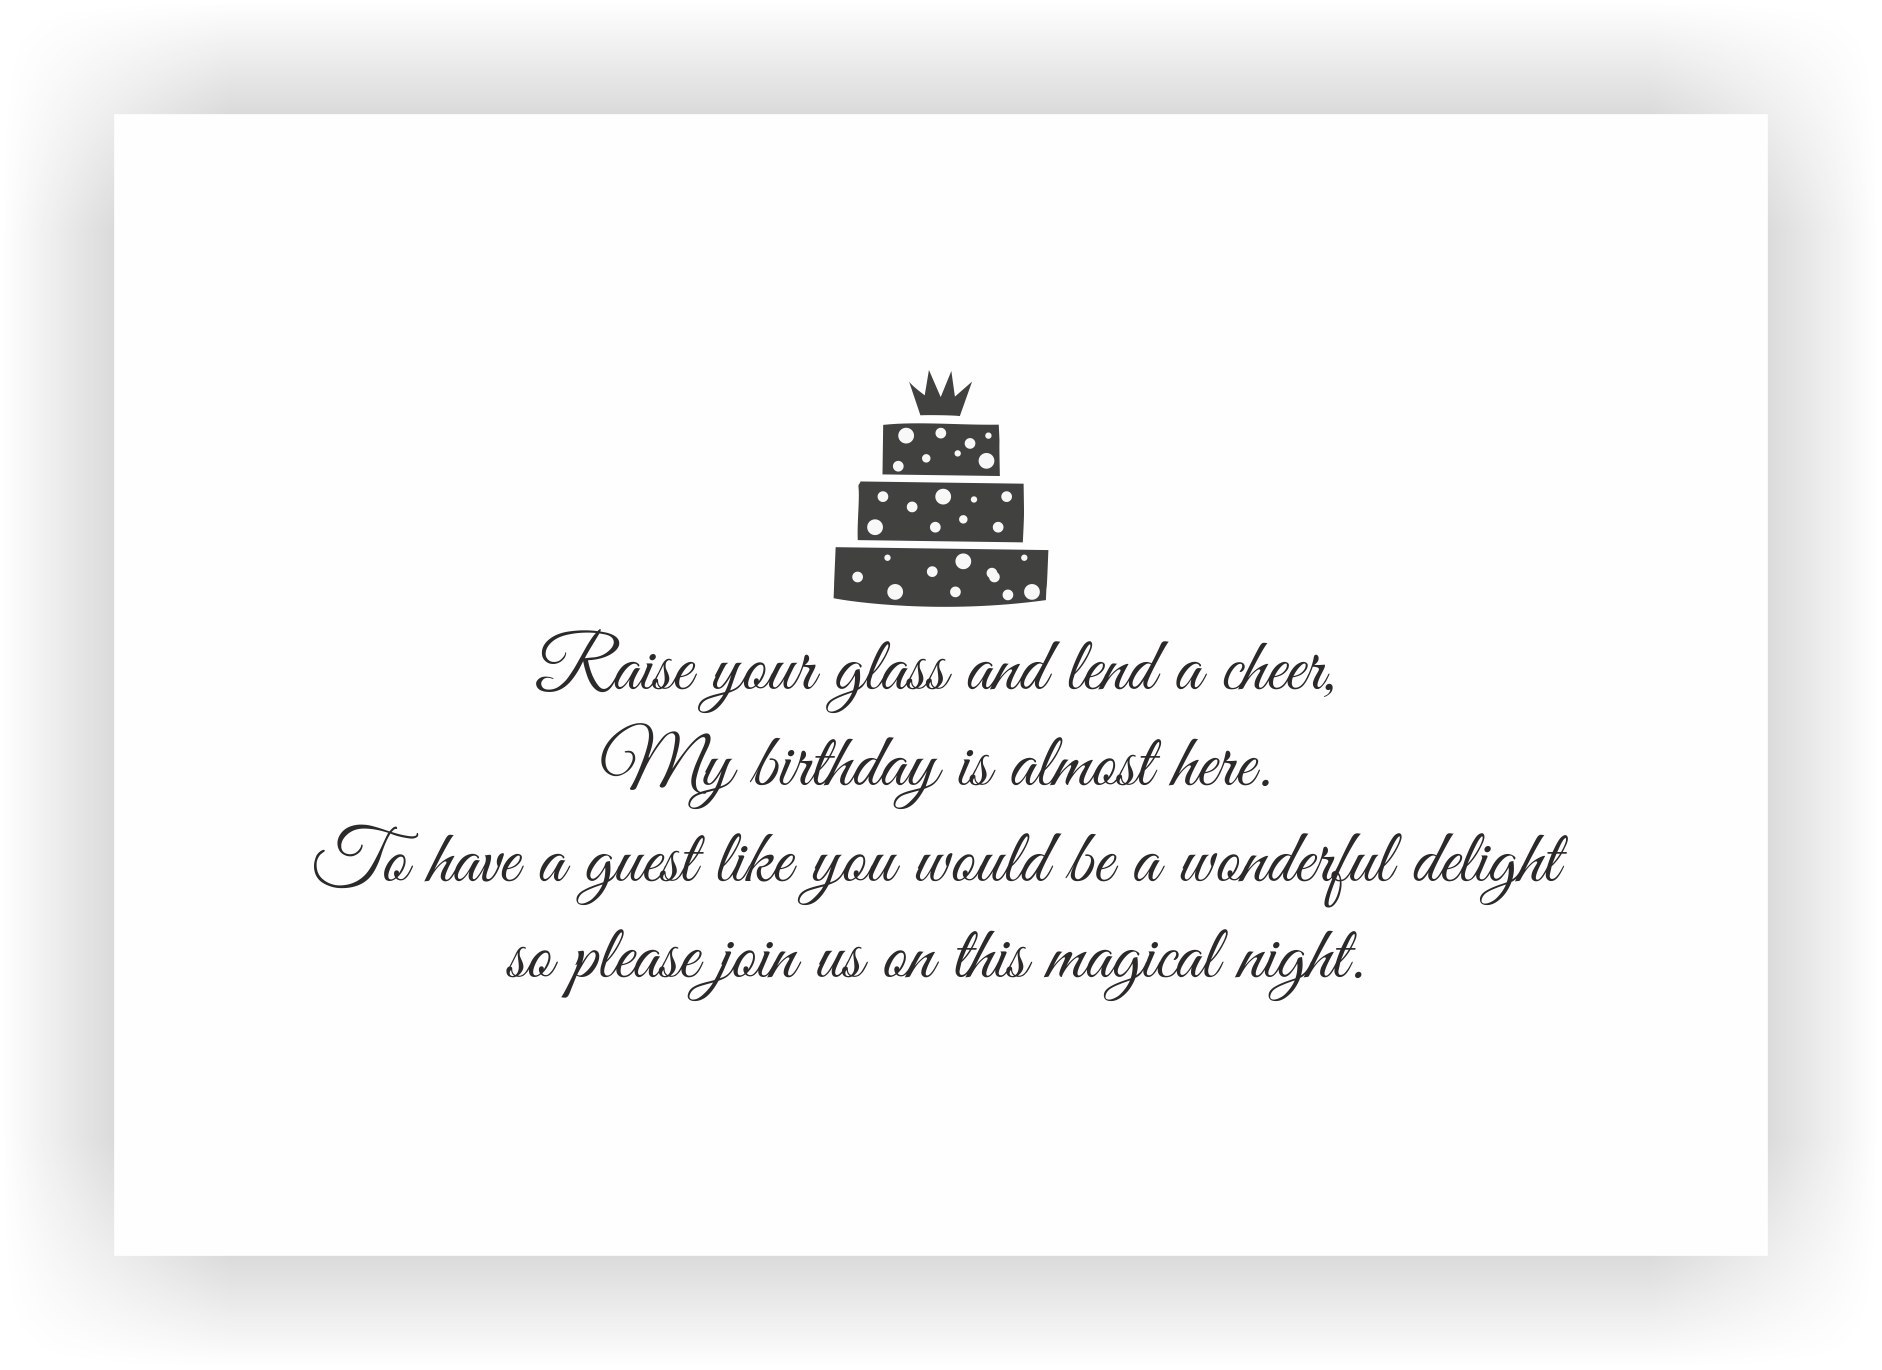 Delighted birthday invitation mail photos non traditional wedding 1st birthday invitations chococraft best 1st birthday invitations delighted birthday invitation mail photos delighted birthday invitation mail photos stopboris Images